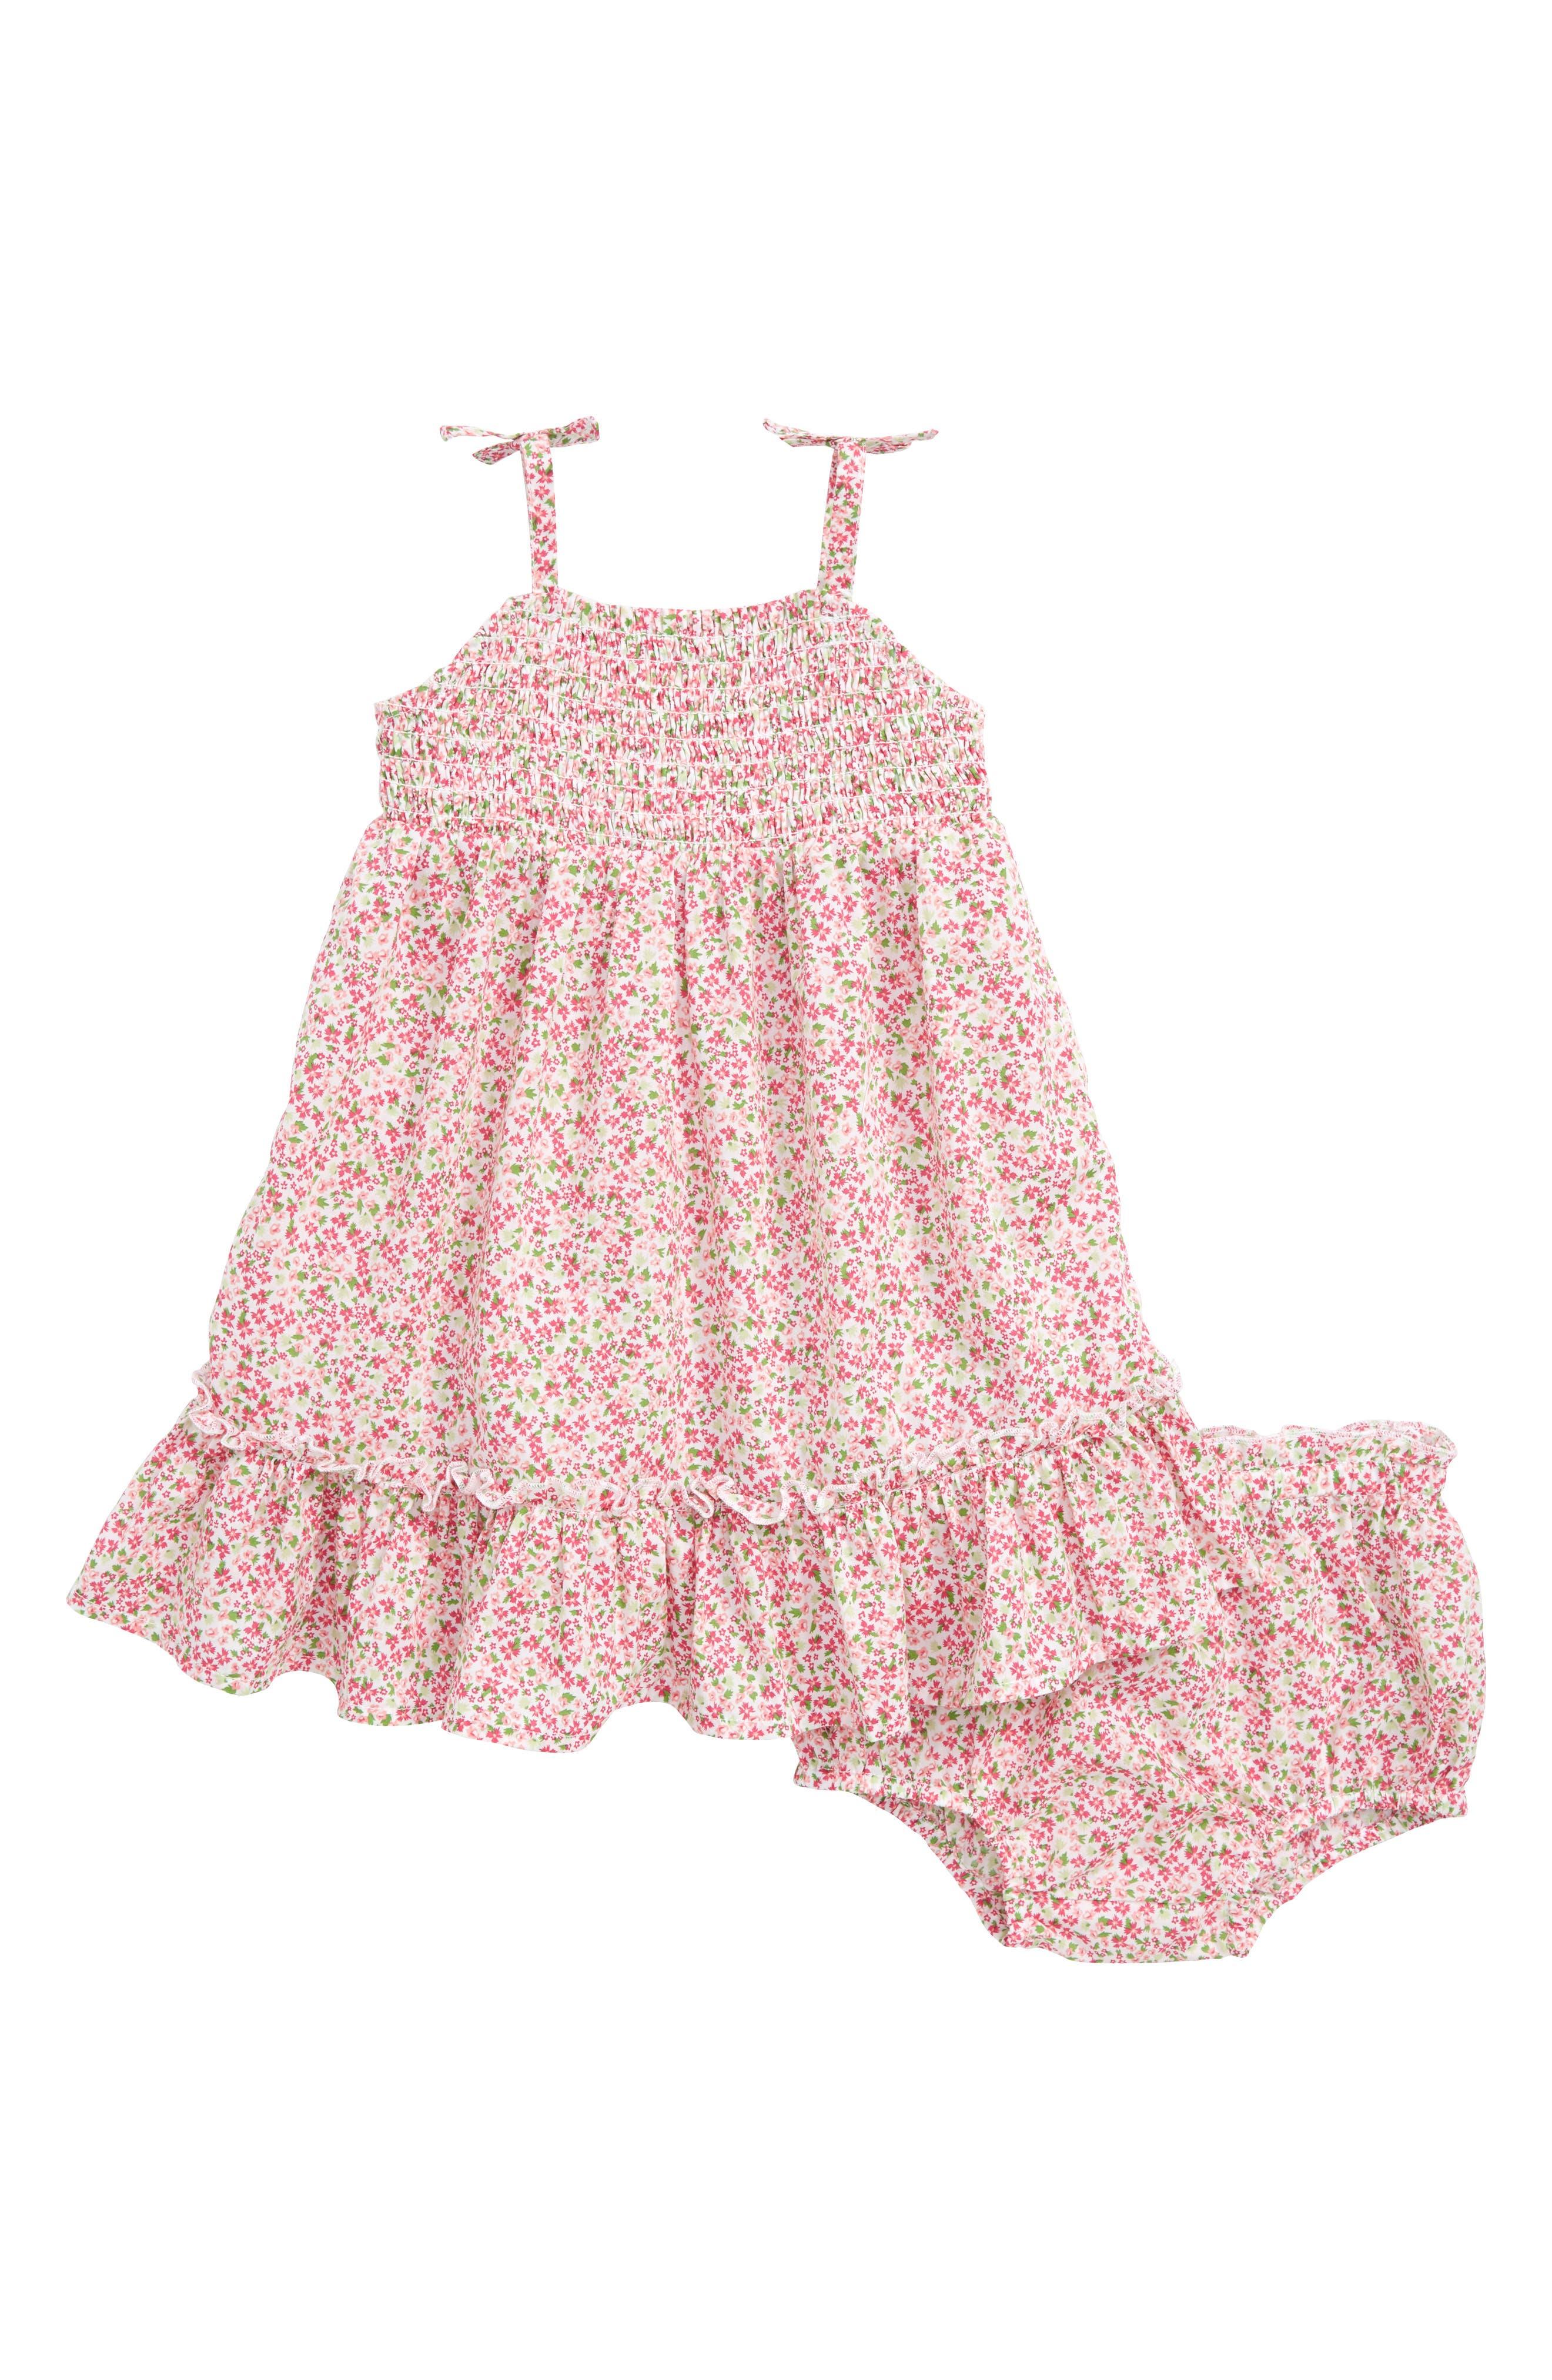 Ditzy Smock Dress,                         Main,                         color, White- Pink Dense Floral